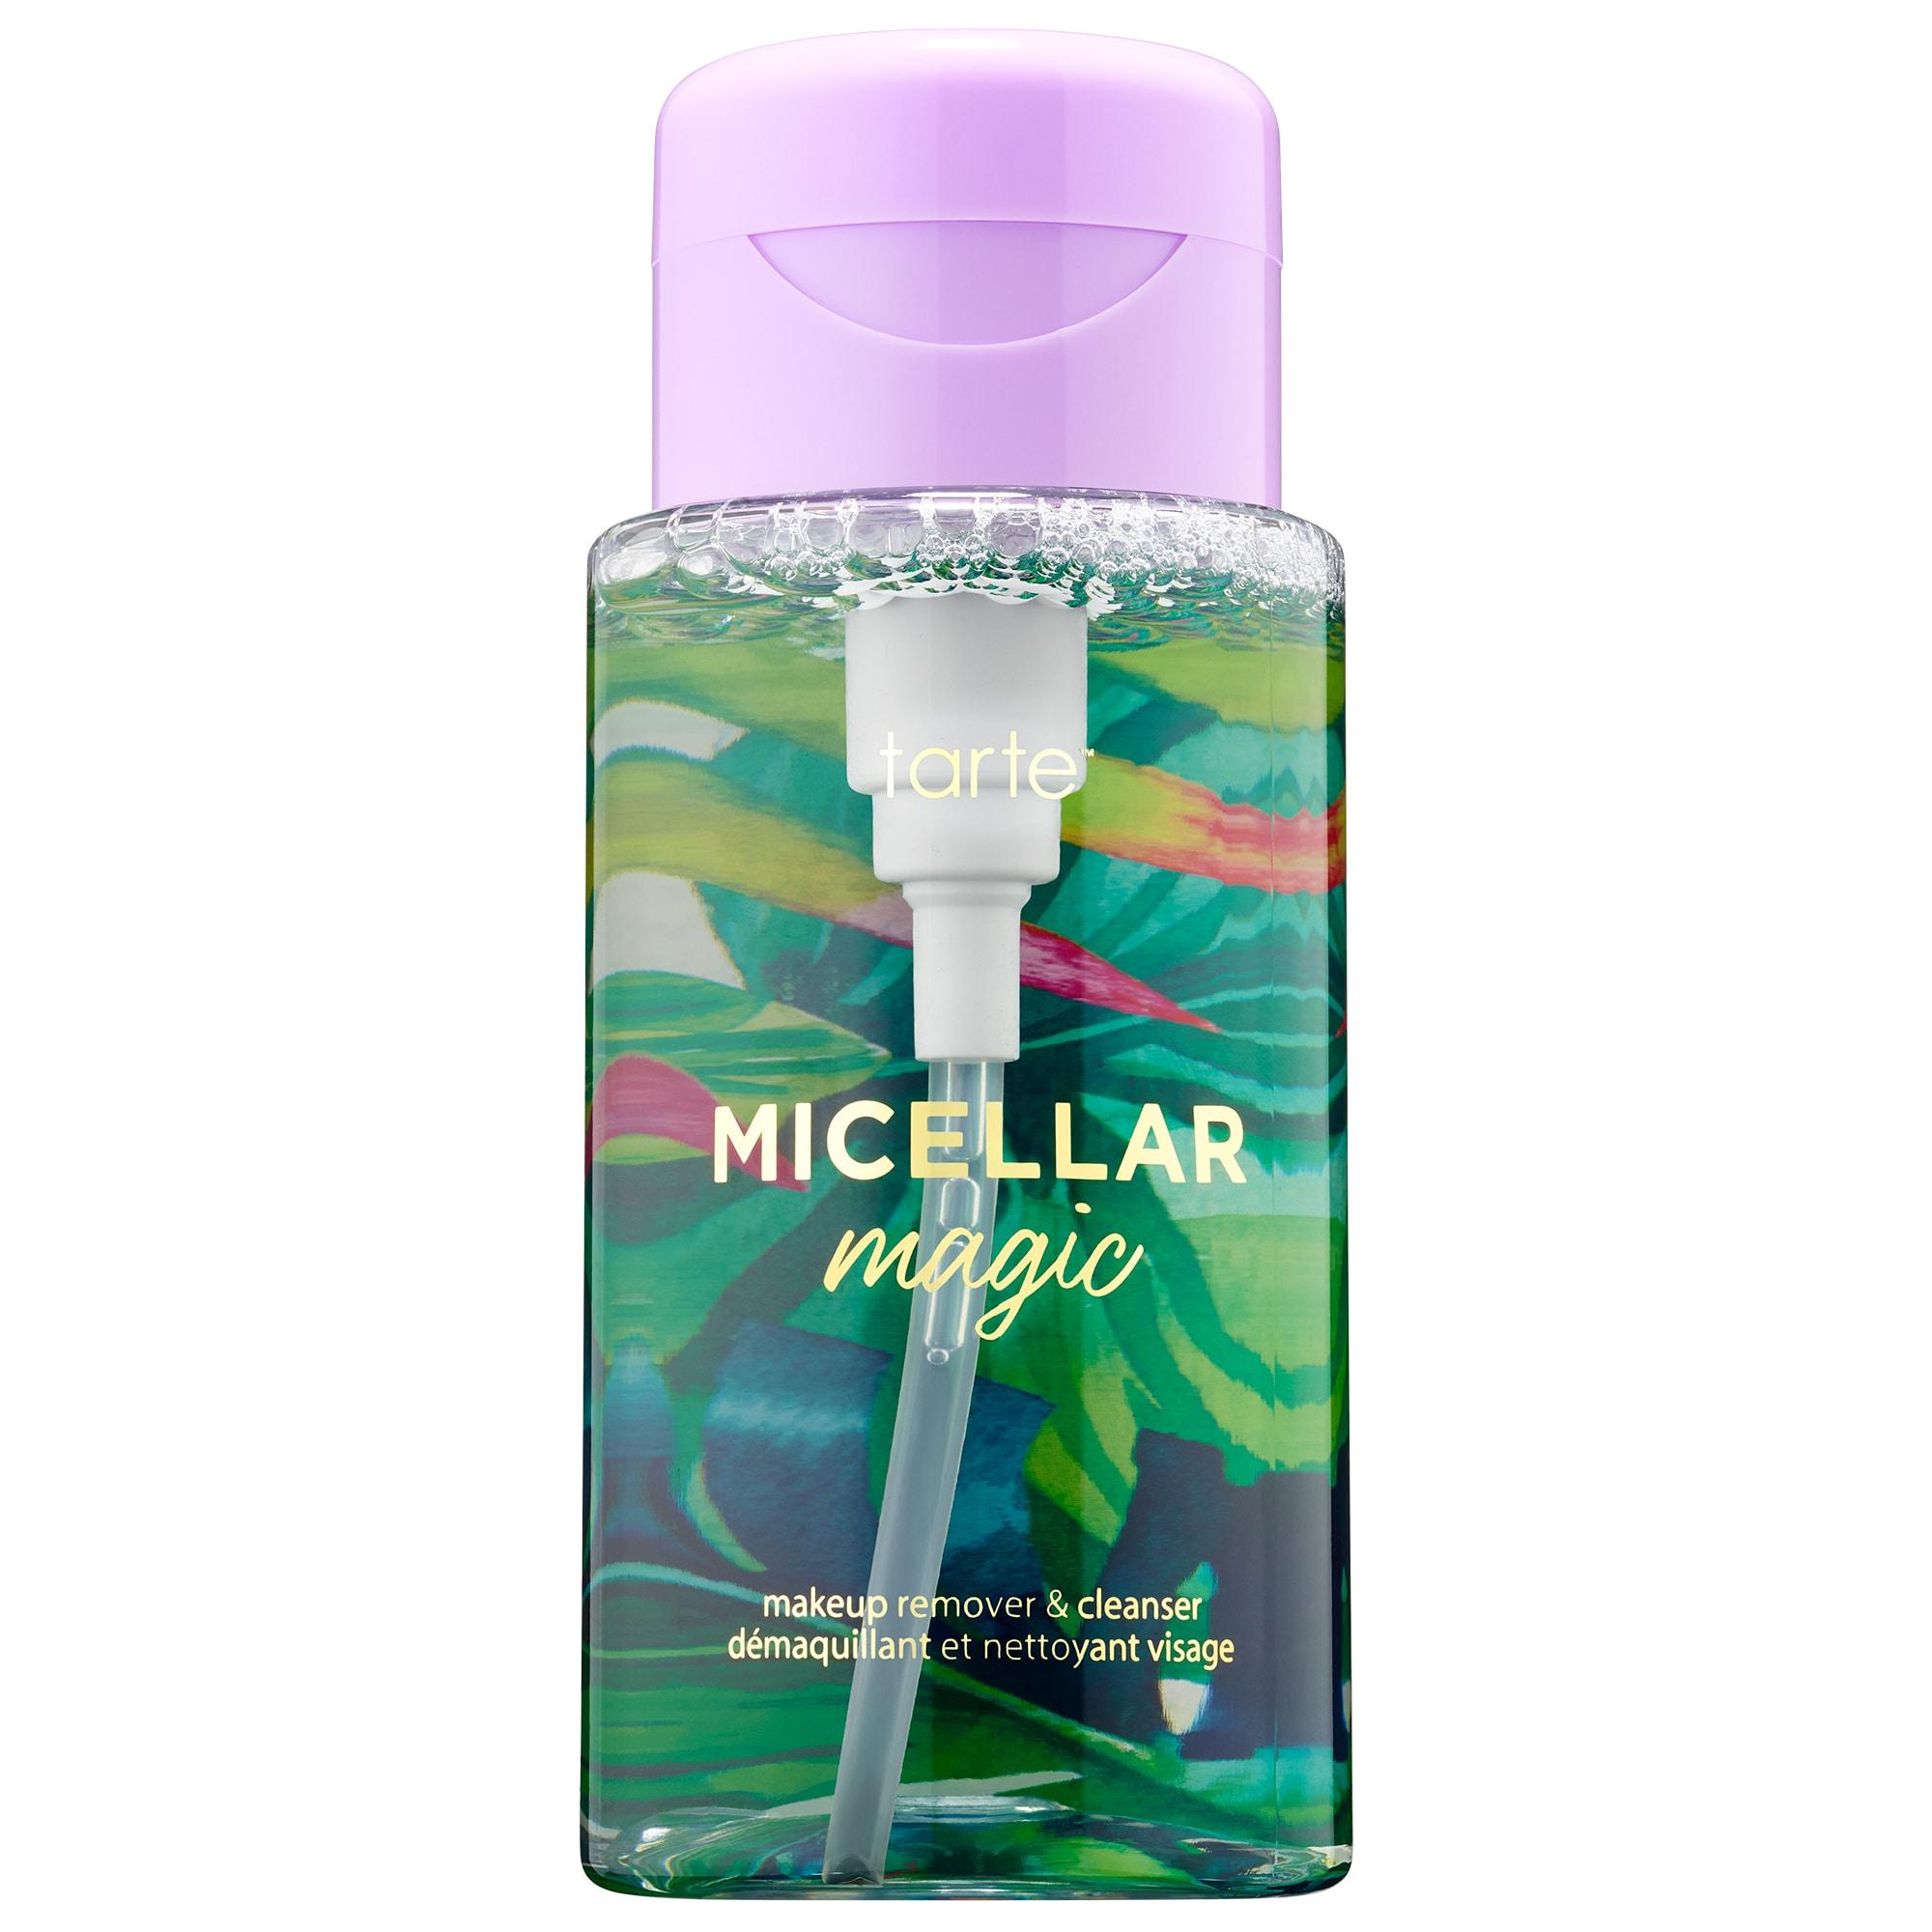 Tarte - Micellar Magic Makeup Remover & Cleanser